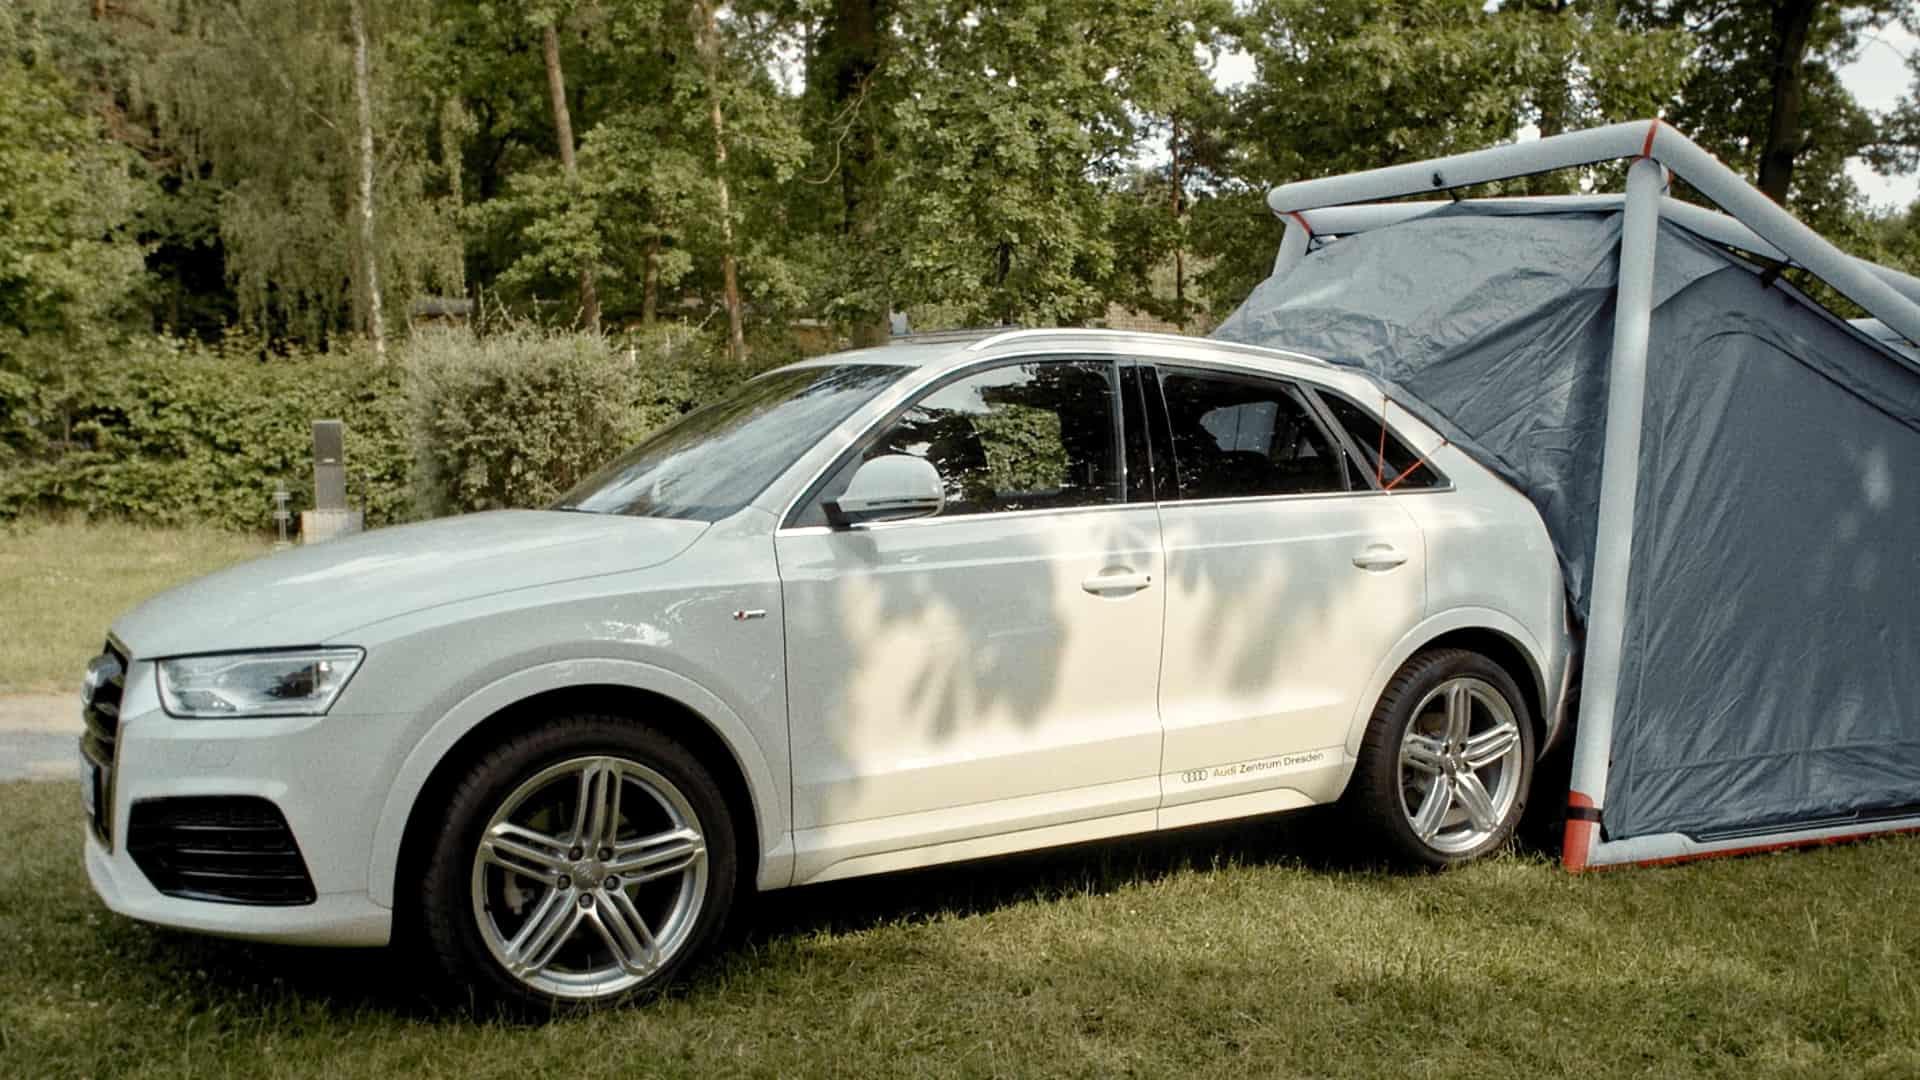 Audi Q3 Zelt